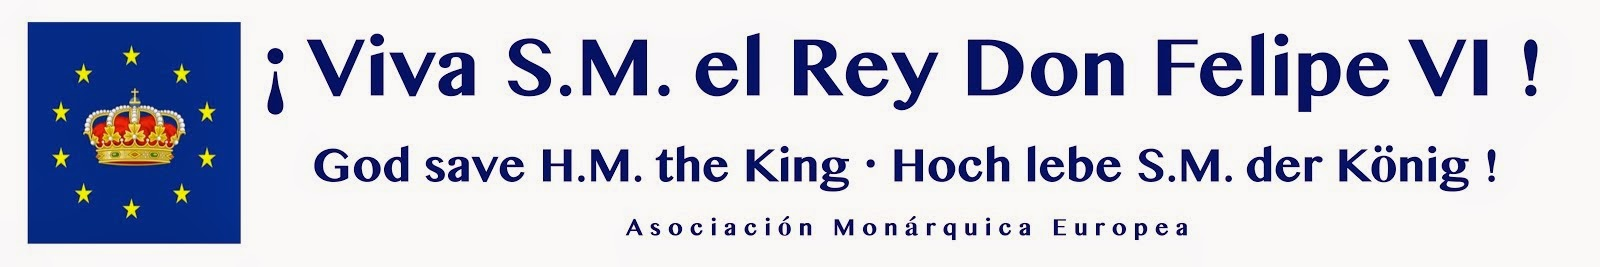 ¡Viva S.M. el Rey Don Felipe VI!